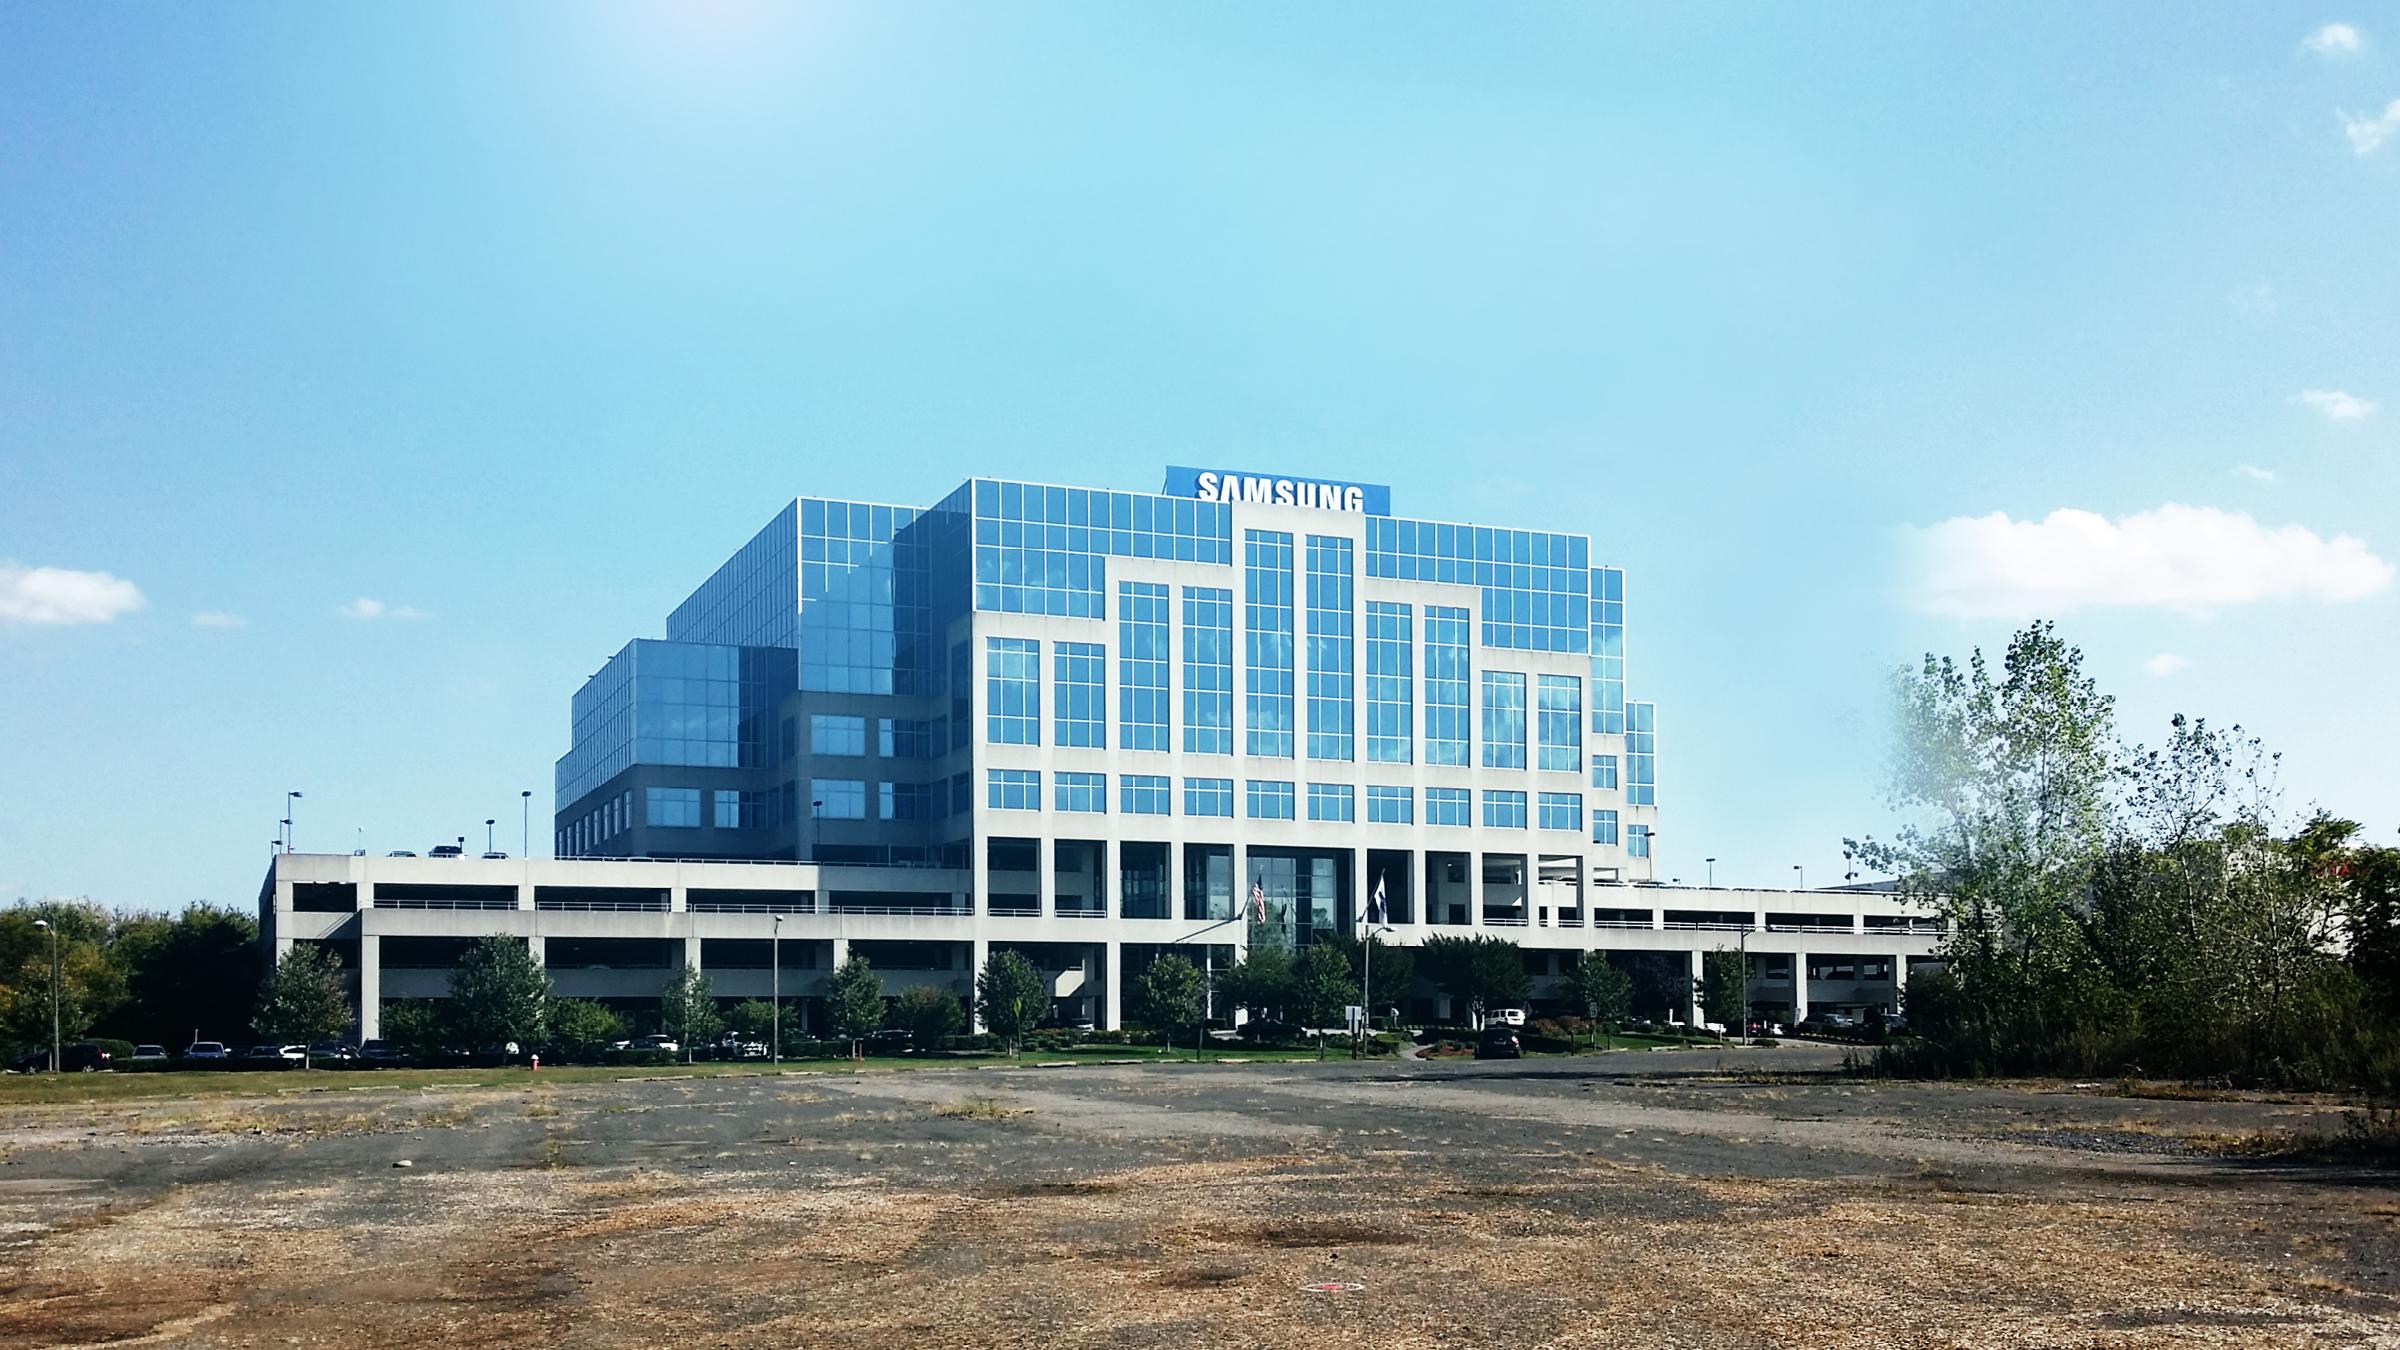 Pioli_Samsung Electronics Headquarters2.png